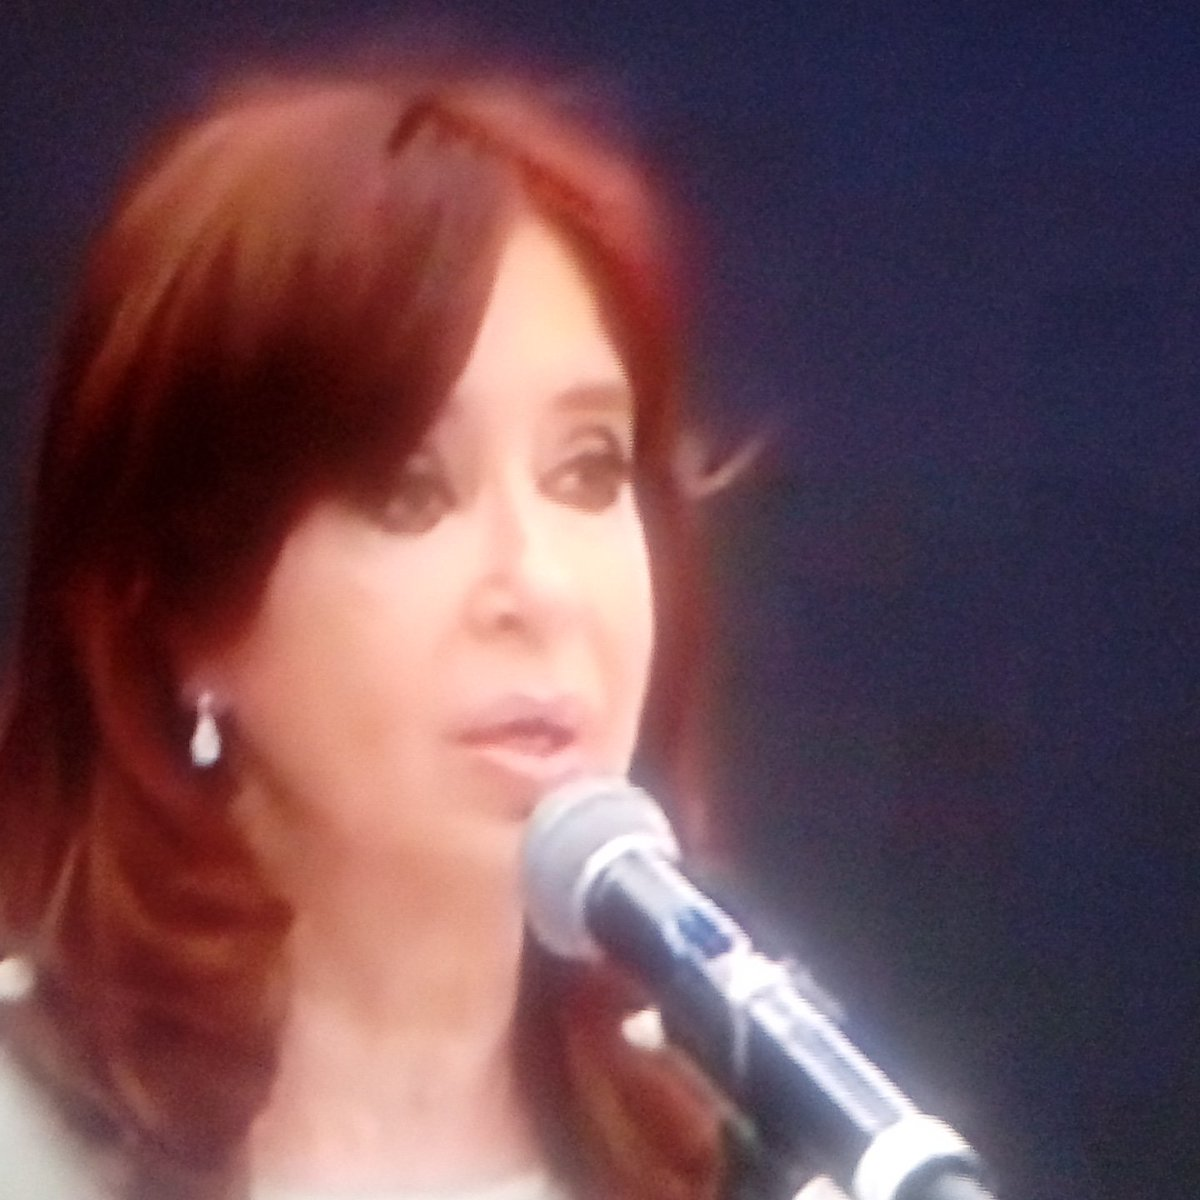 Maria Cristina.Amor's photo on #PongamosUnaFotoDeCFK